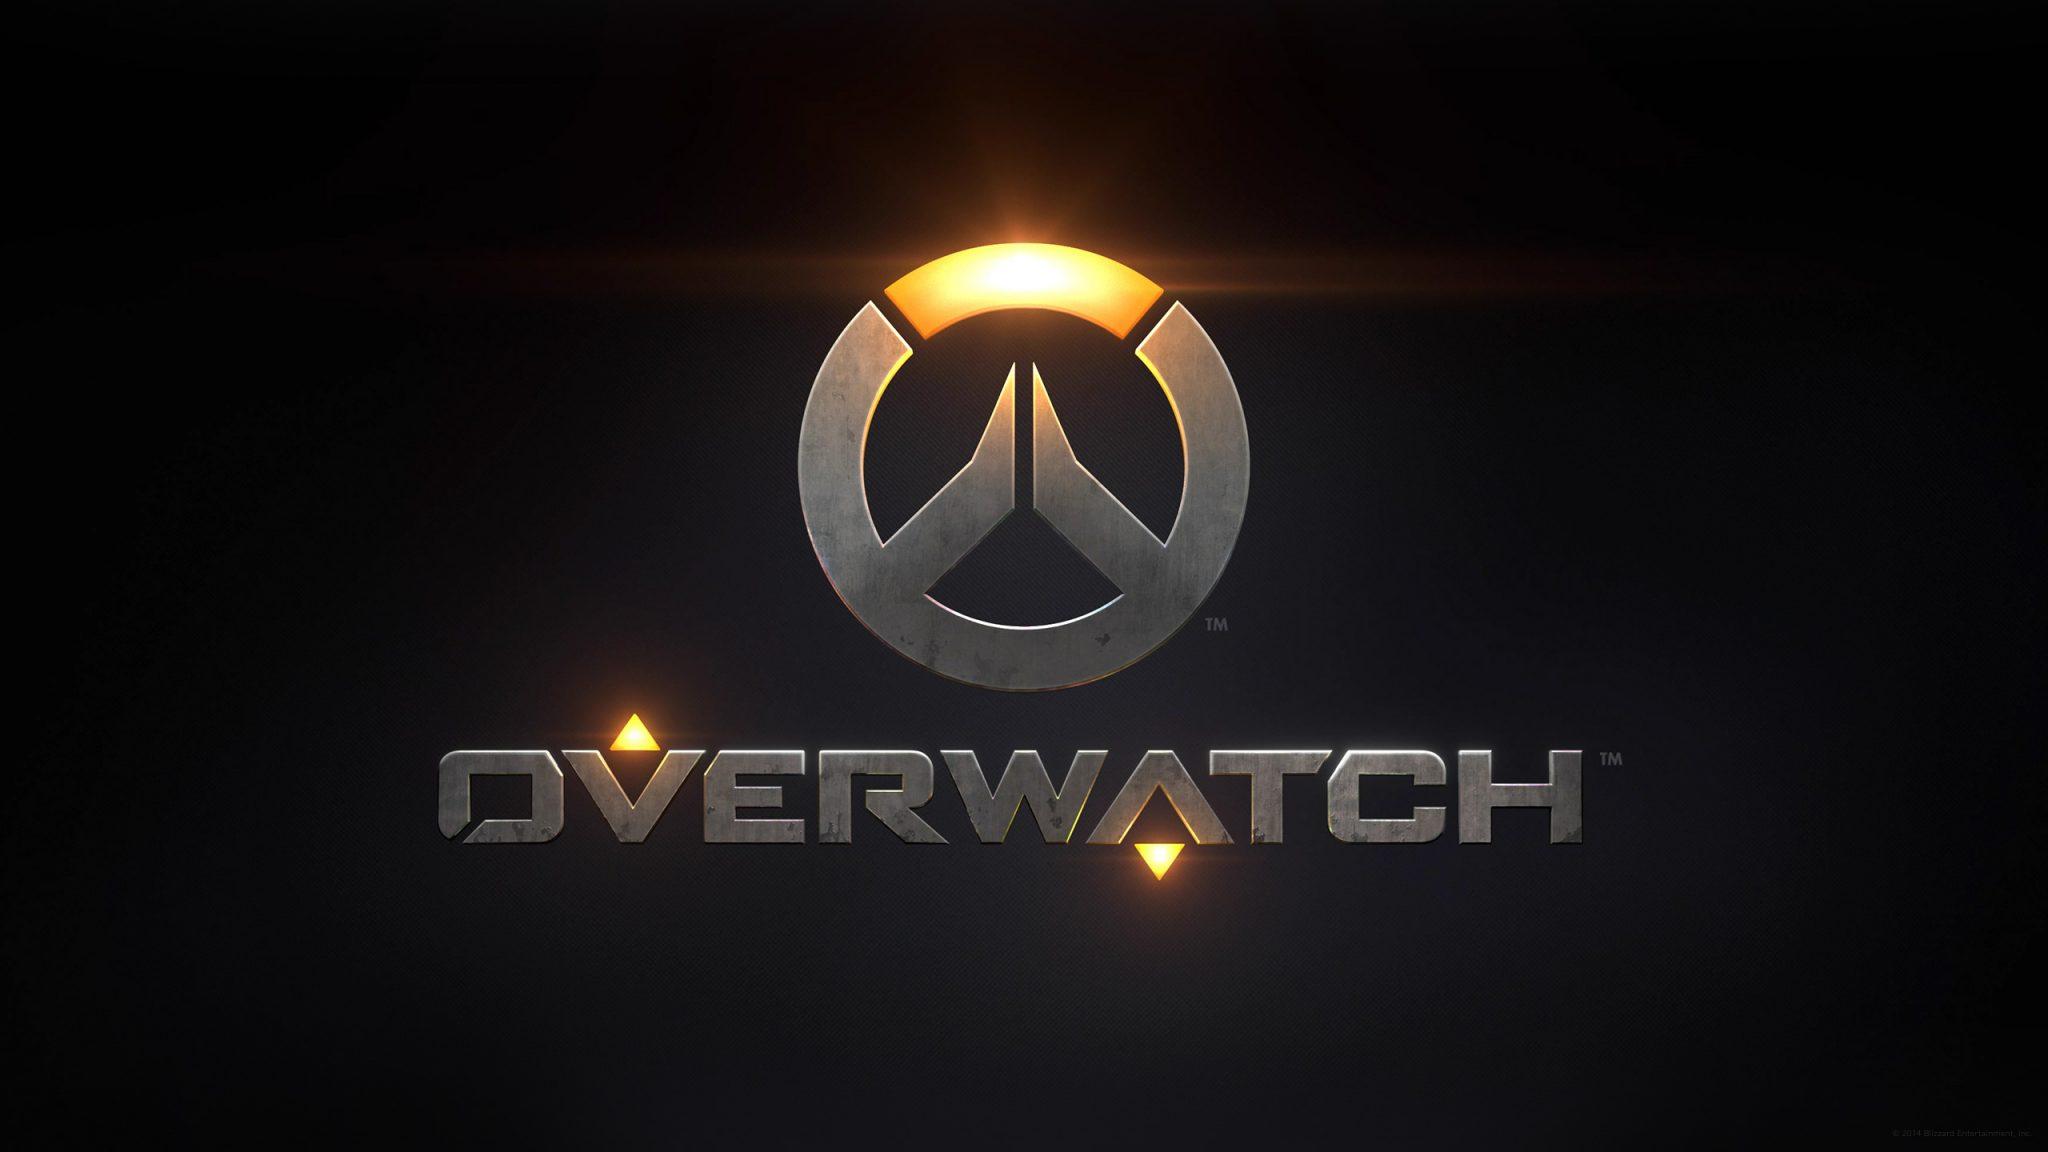 Overwatch: annunciata la nuova stagione competitiva ed una nuova skin leggendaria - Games Ninja